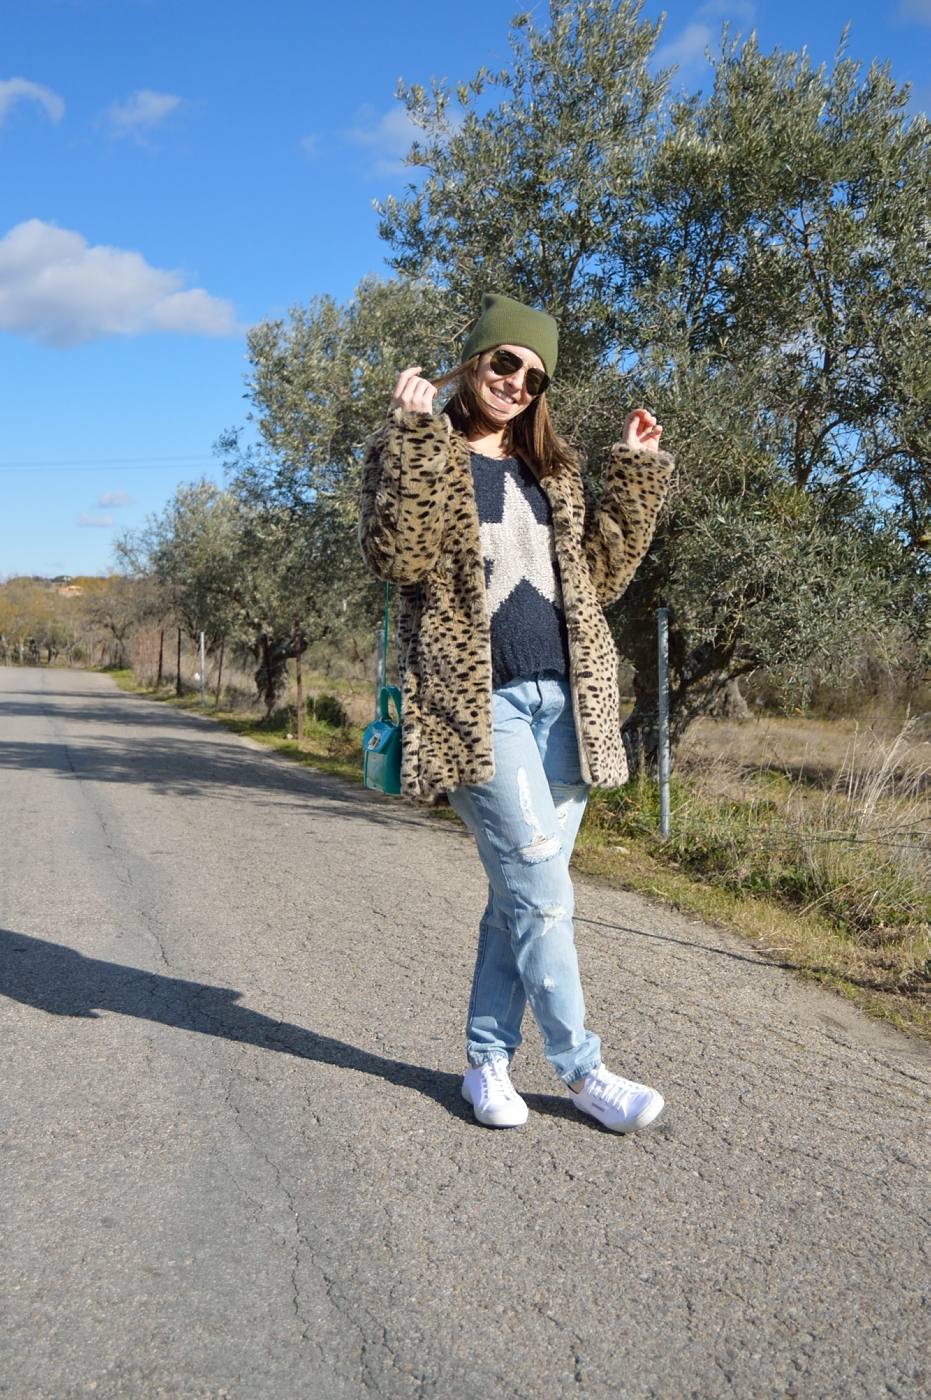 lara-vazquez-mad-lula-style-streetstyle-look-winter-fashion-art